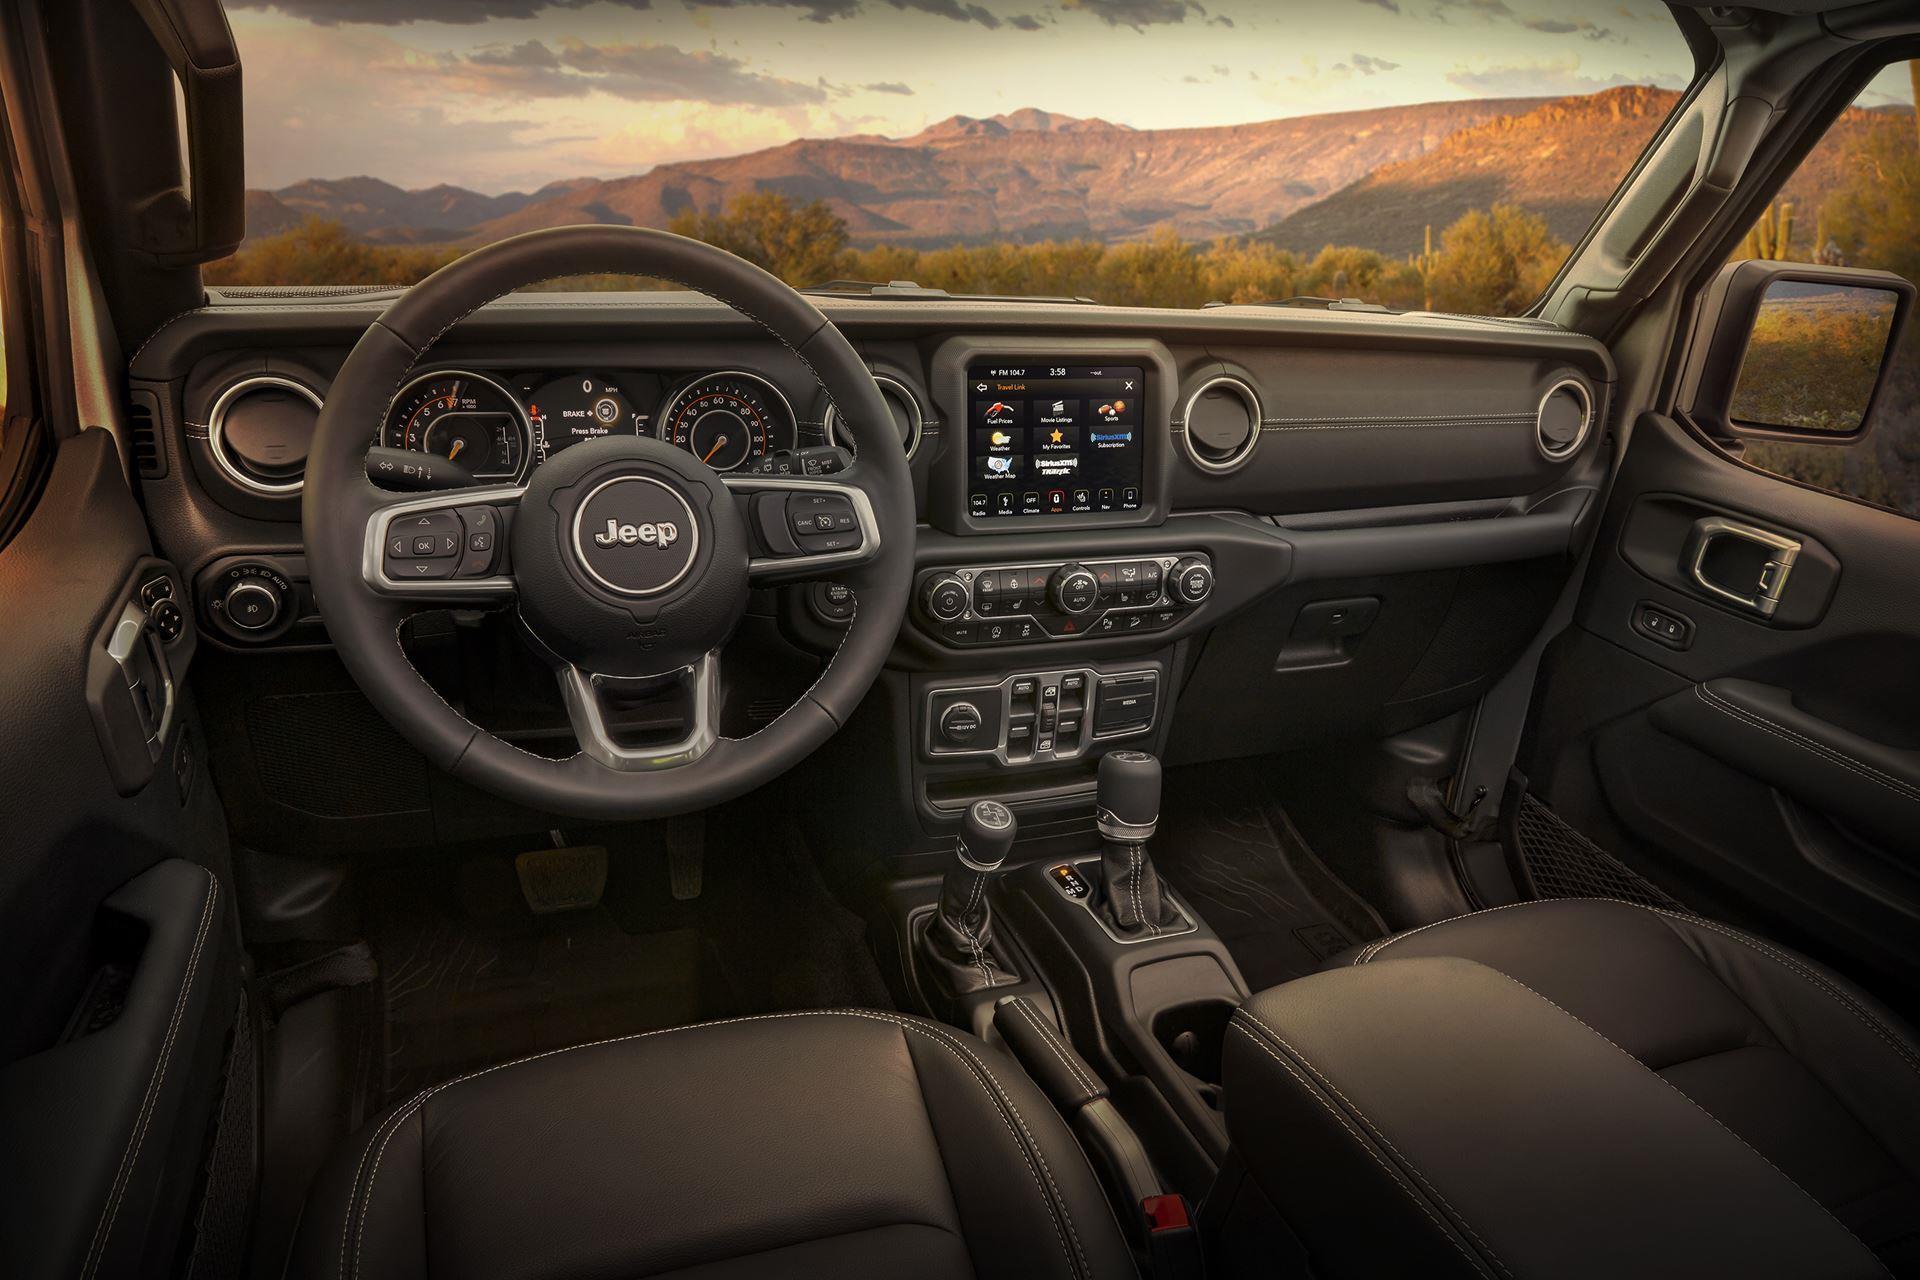 2018 Jeep Wrangler Moab Edition